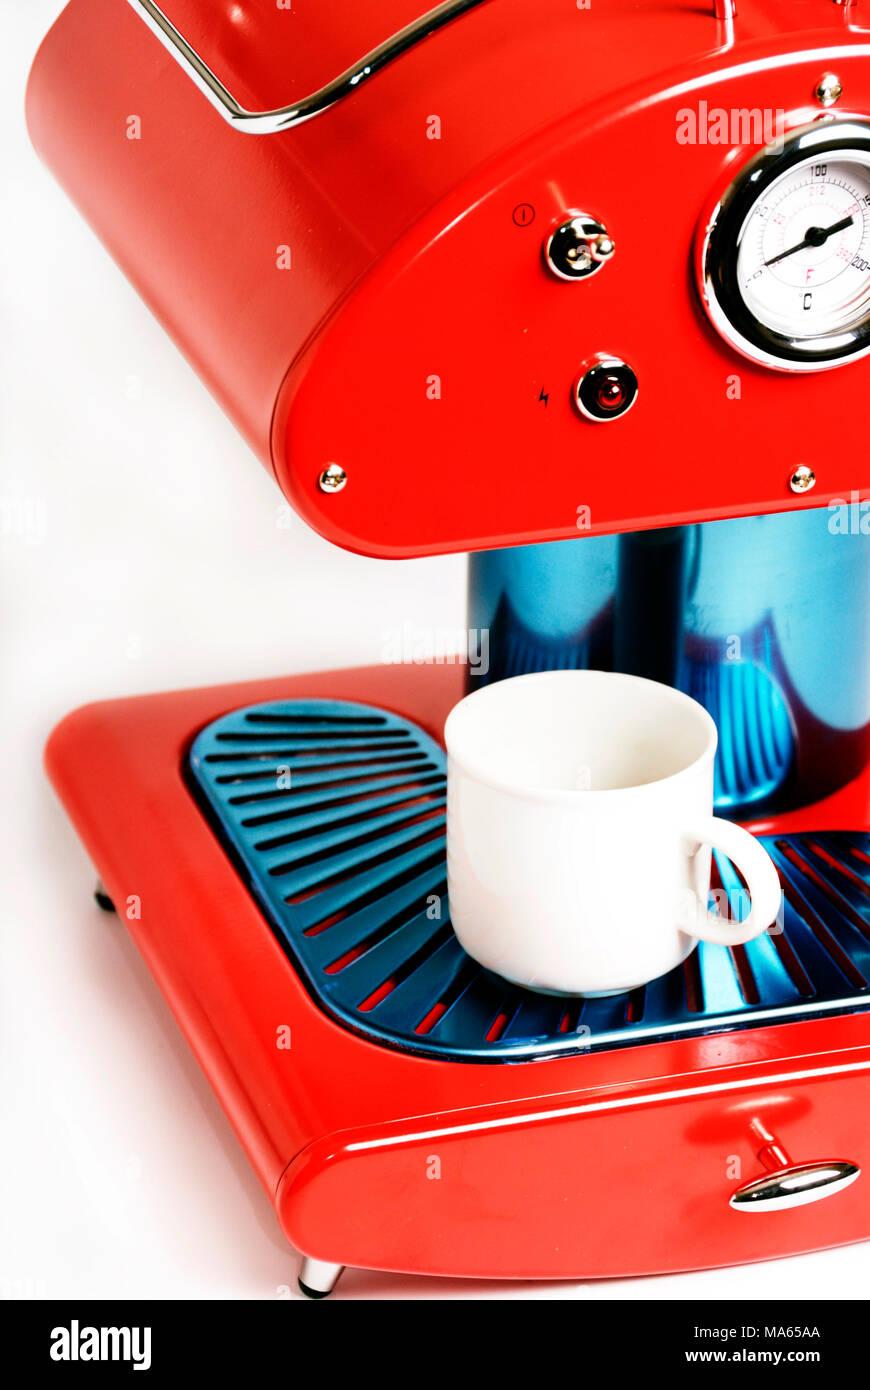 Retro Red Coffee Maker Stock Photo 178386162 Alamy